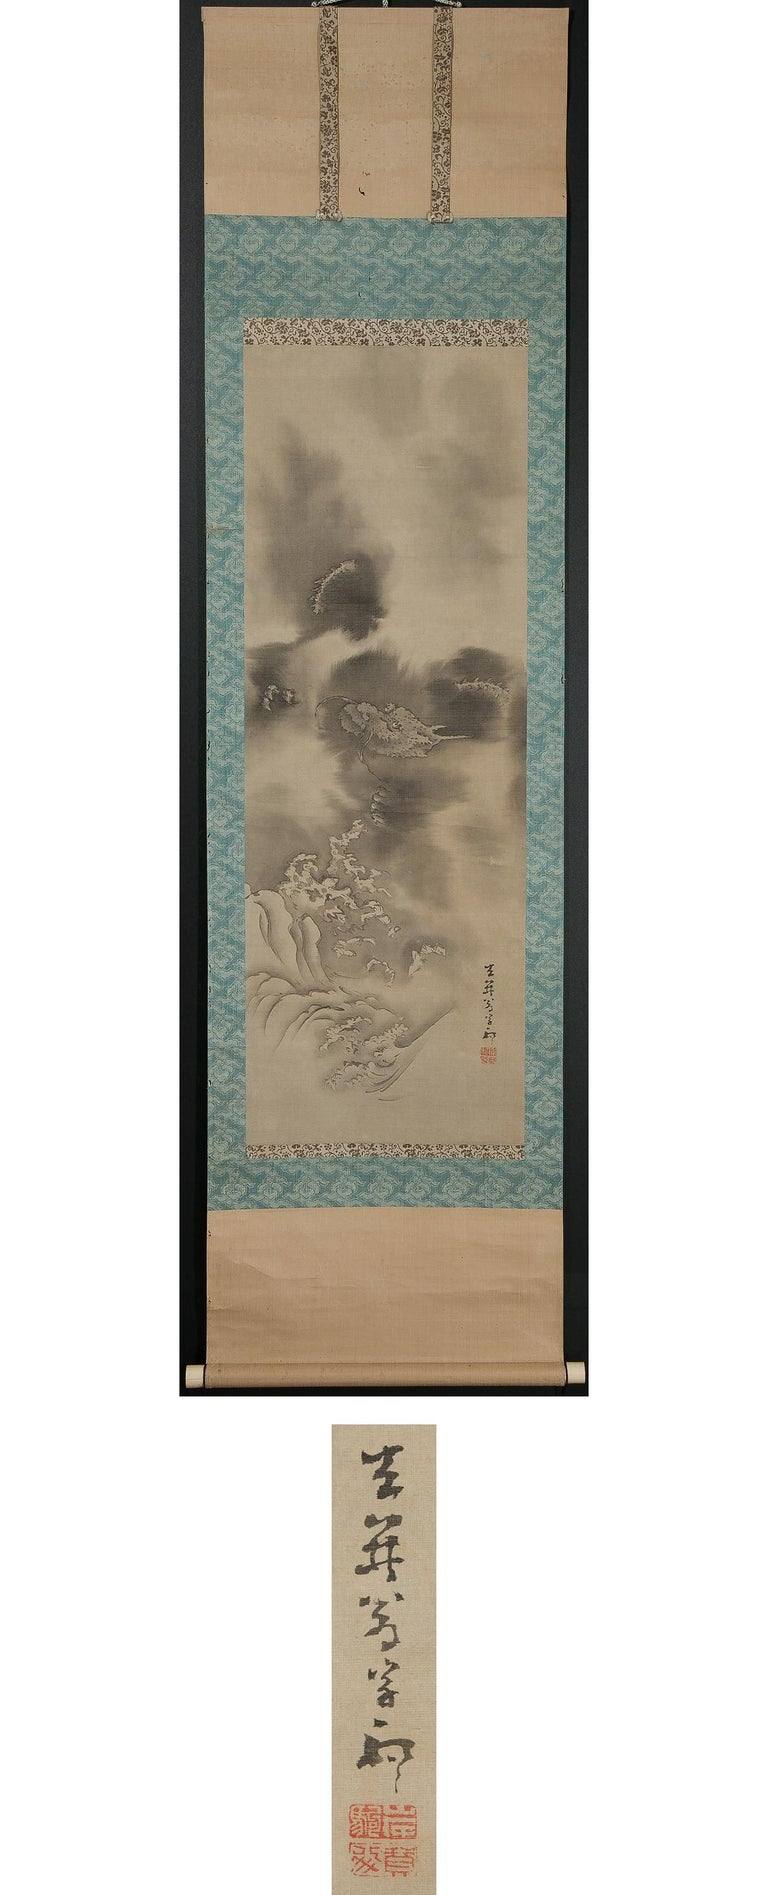 Lovely Edo Period Scroll Paintings Japan Artist Saeki Kishi Ganku Dragon Clouds For Sale 3